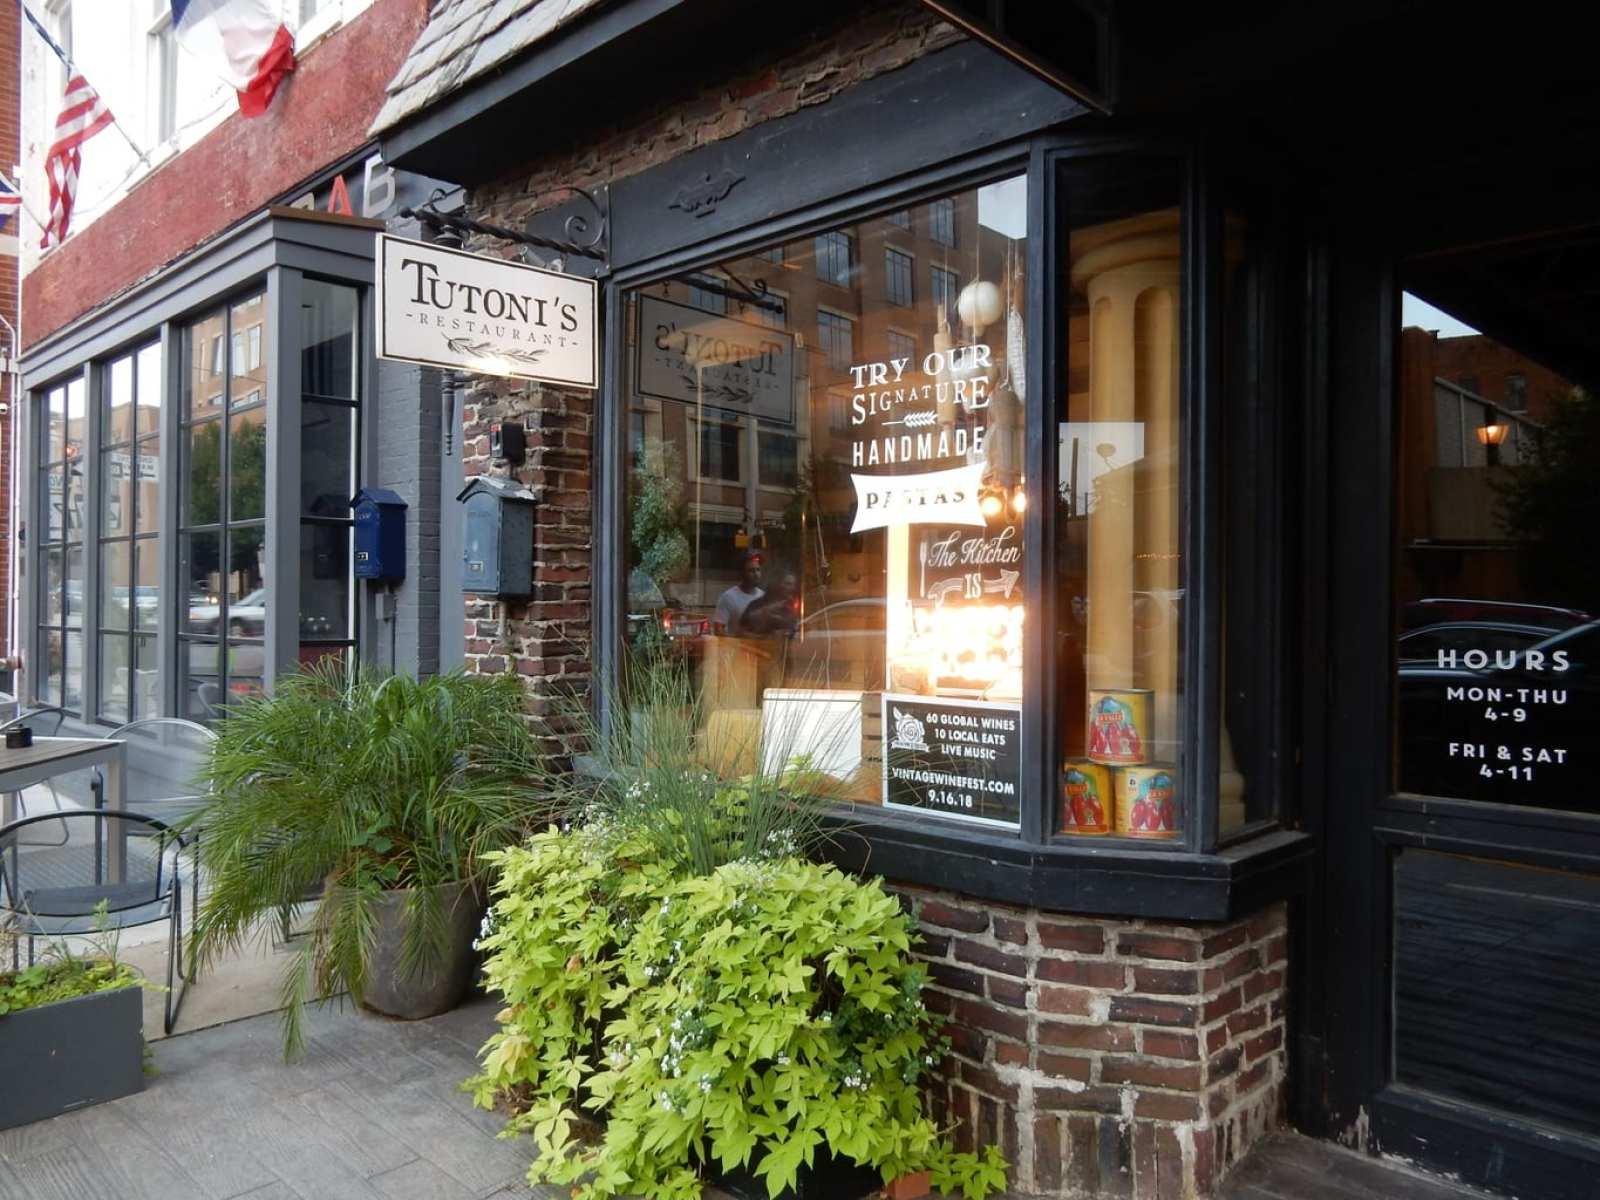 Tutonis Restaurant York PA